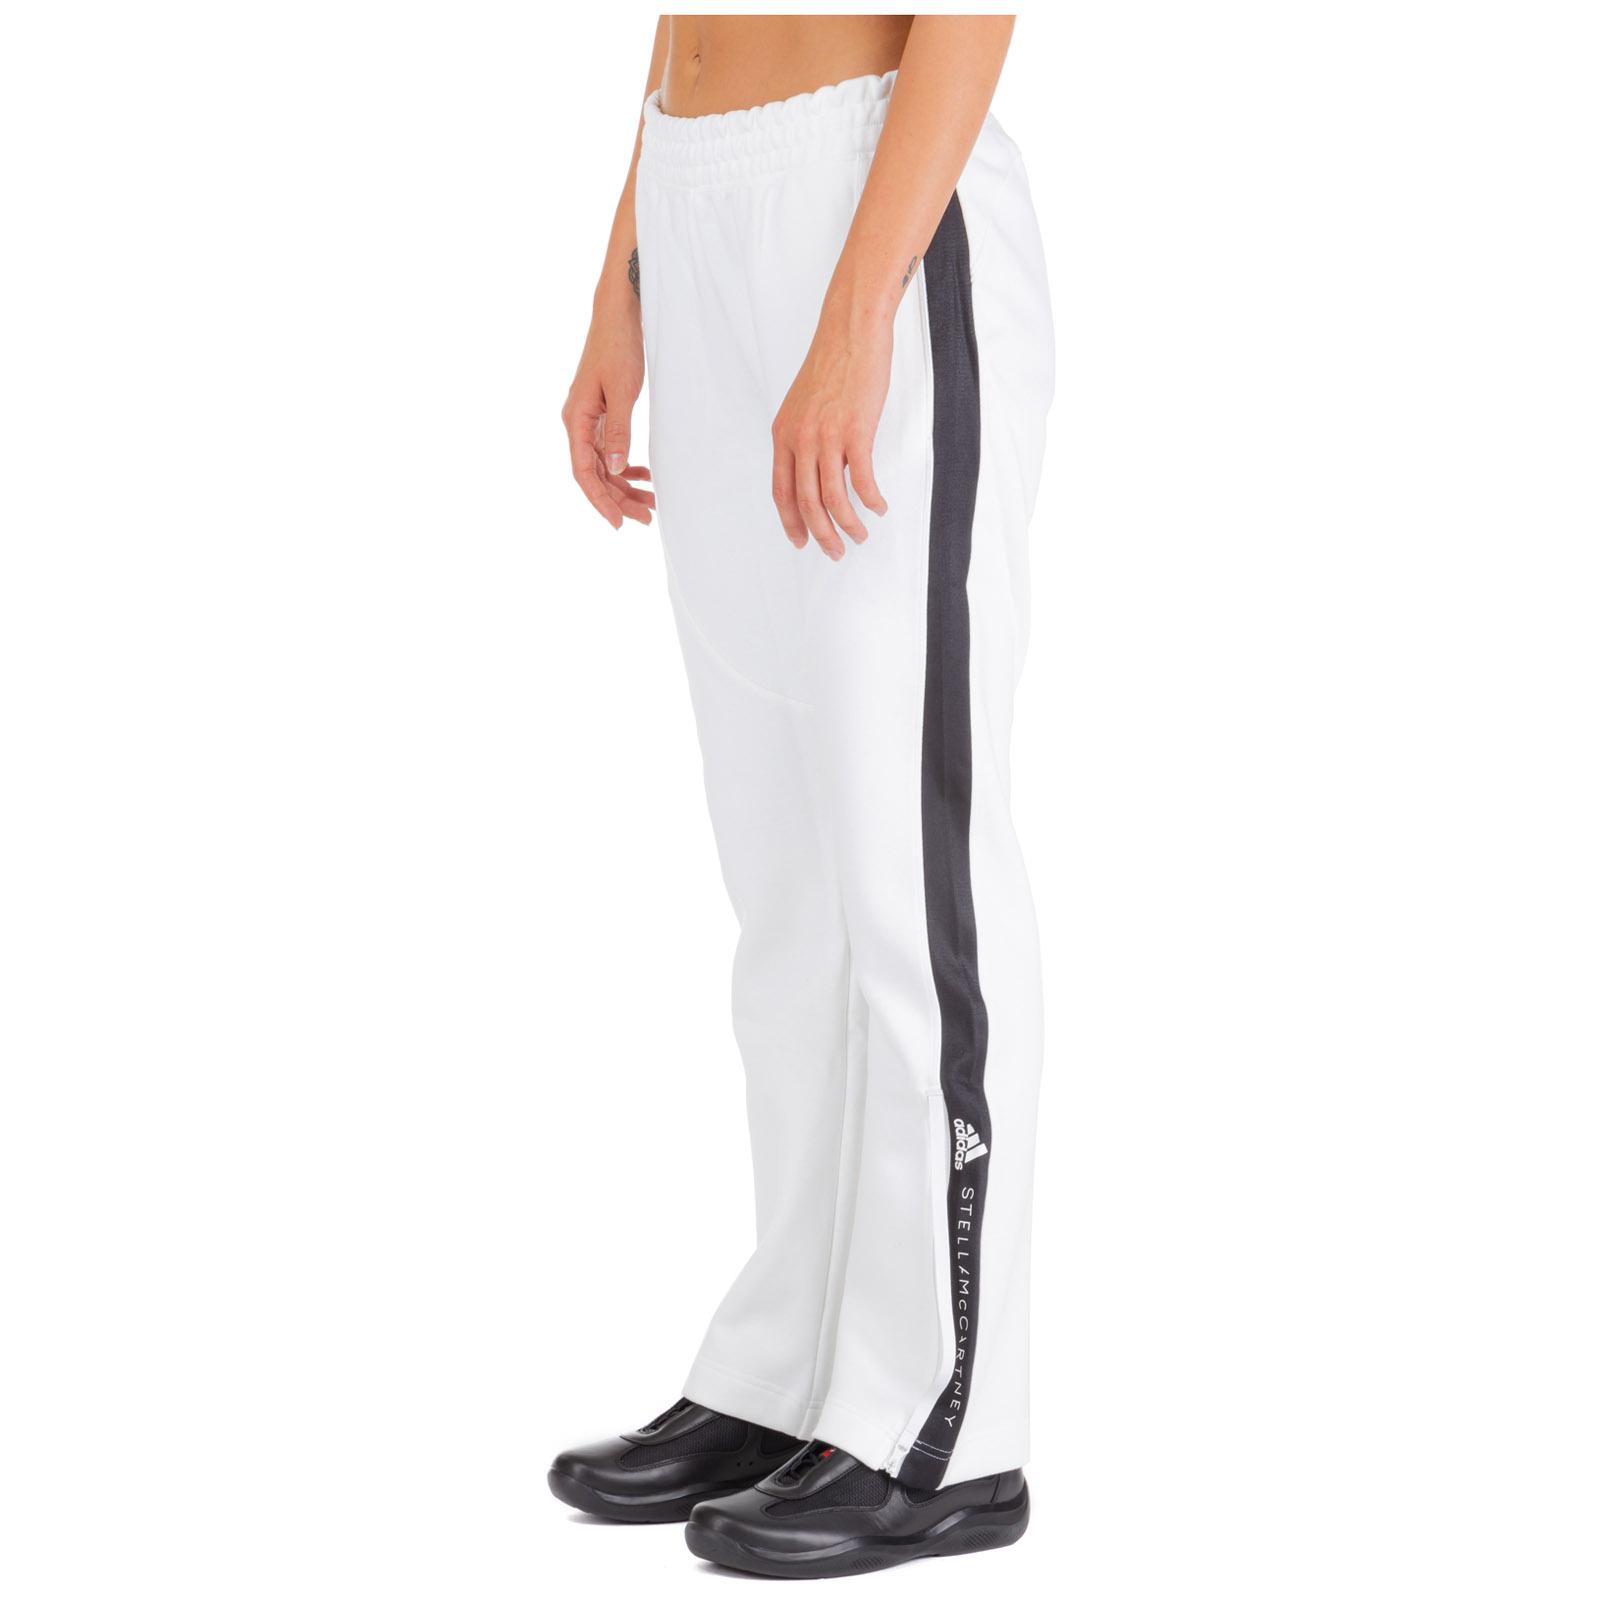 pantaloni tuta donna adidas bianco